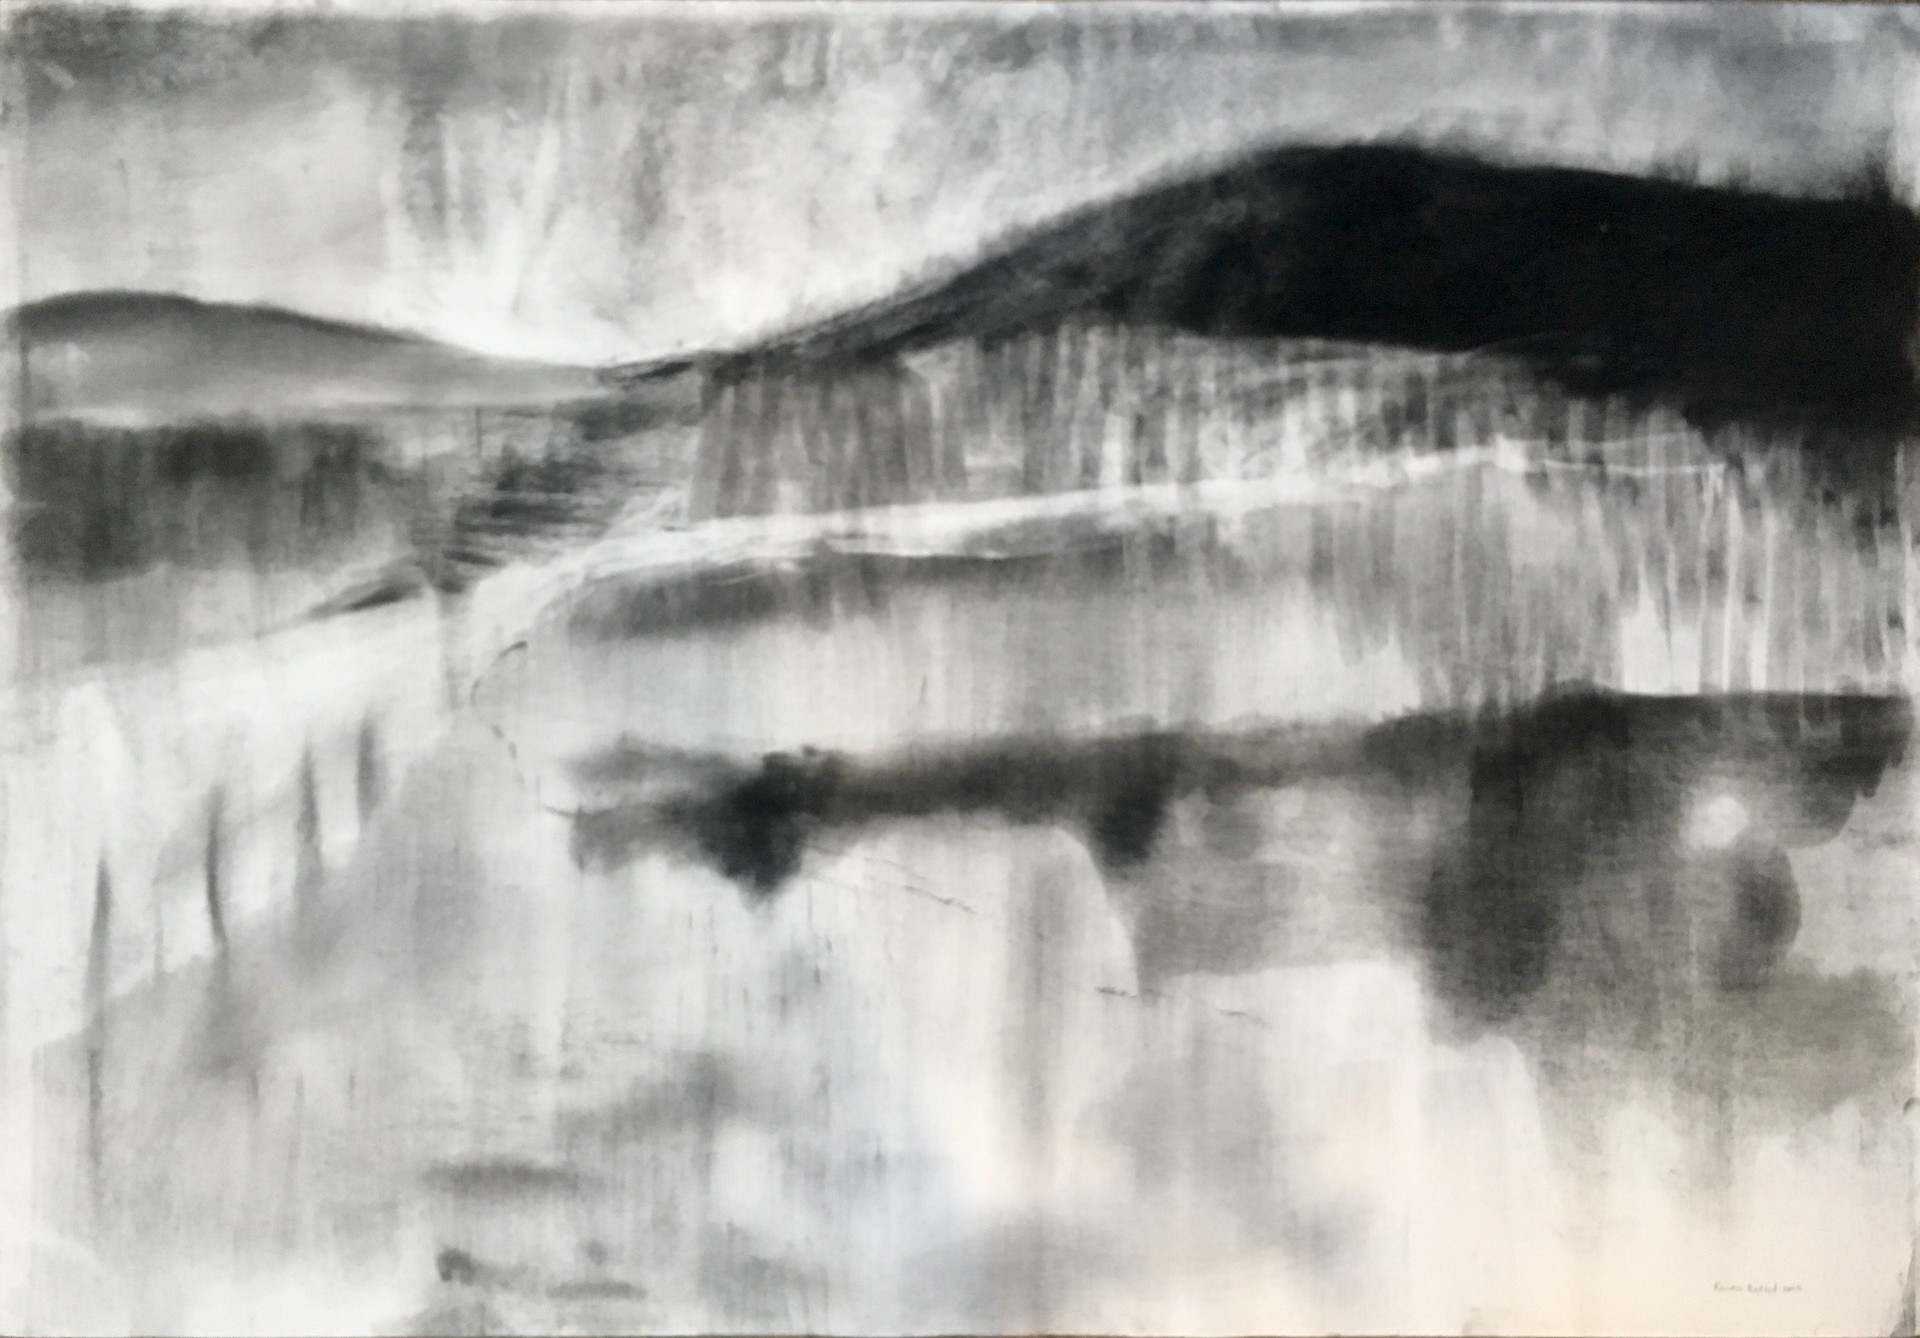 WEERKAATSING 2019 Charcoal on cotton paper 69 x 98cm